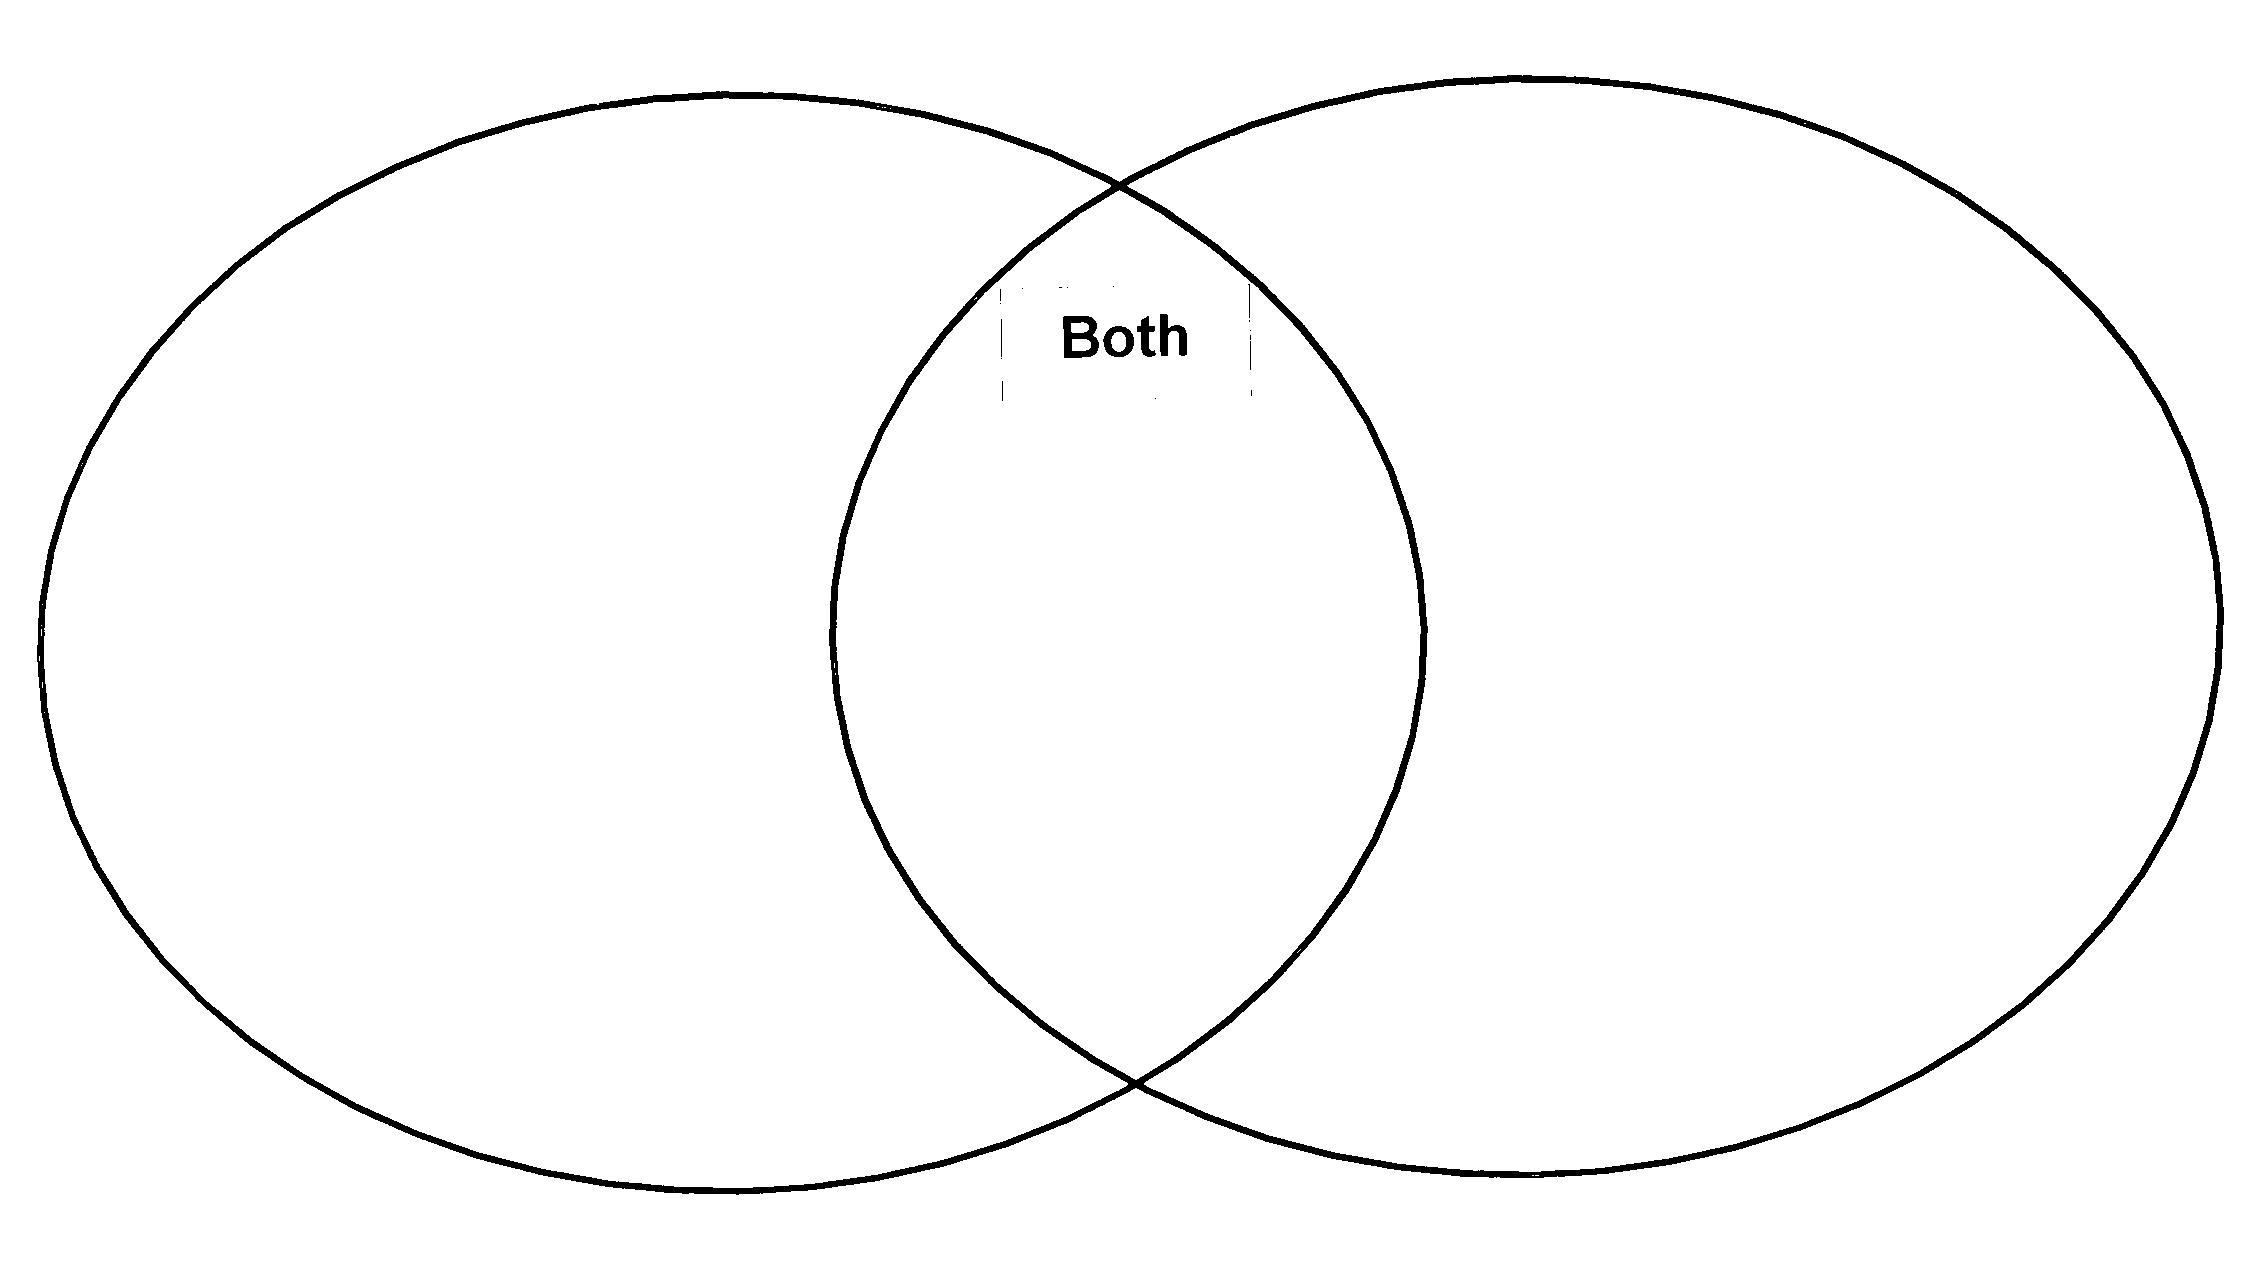 cinderella venn diagram compare contrast directv swm setup posts literature discovery studying classics growing